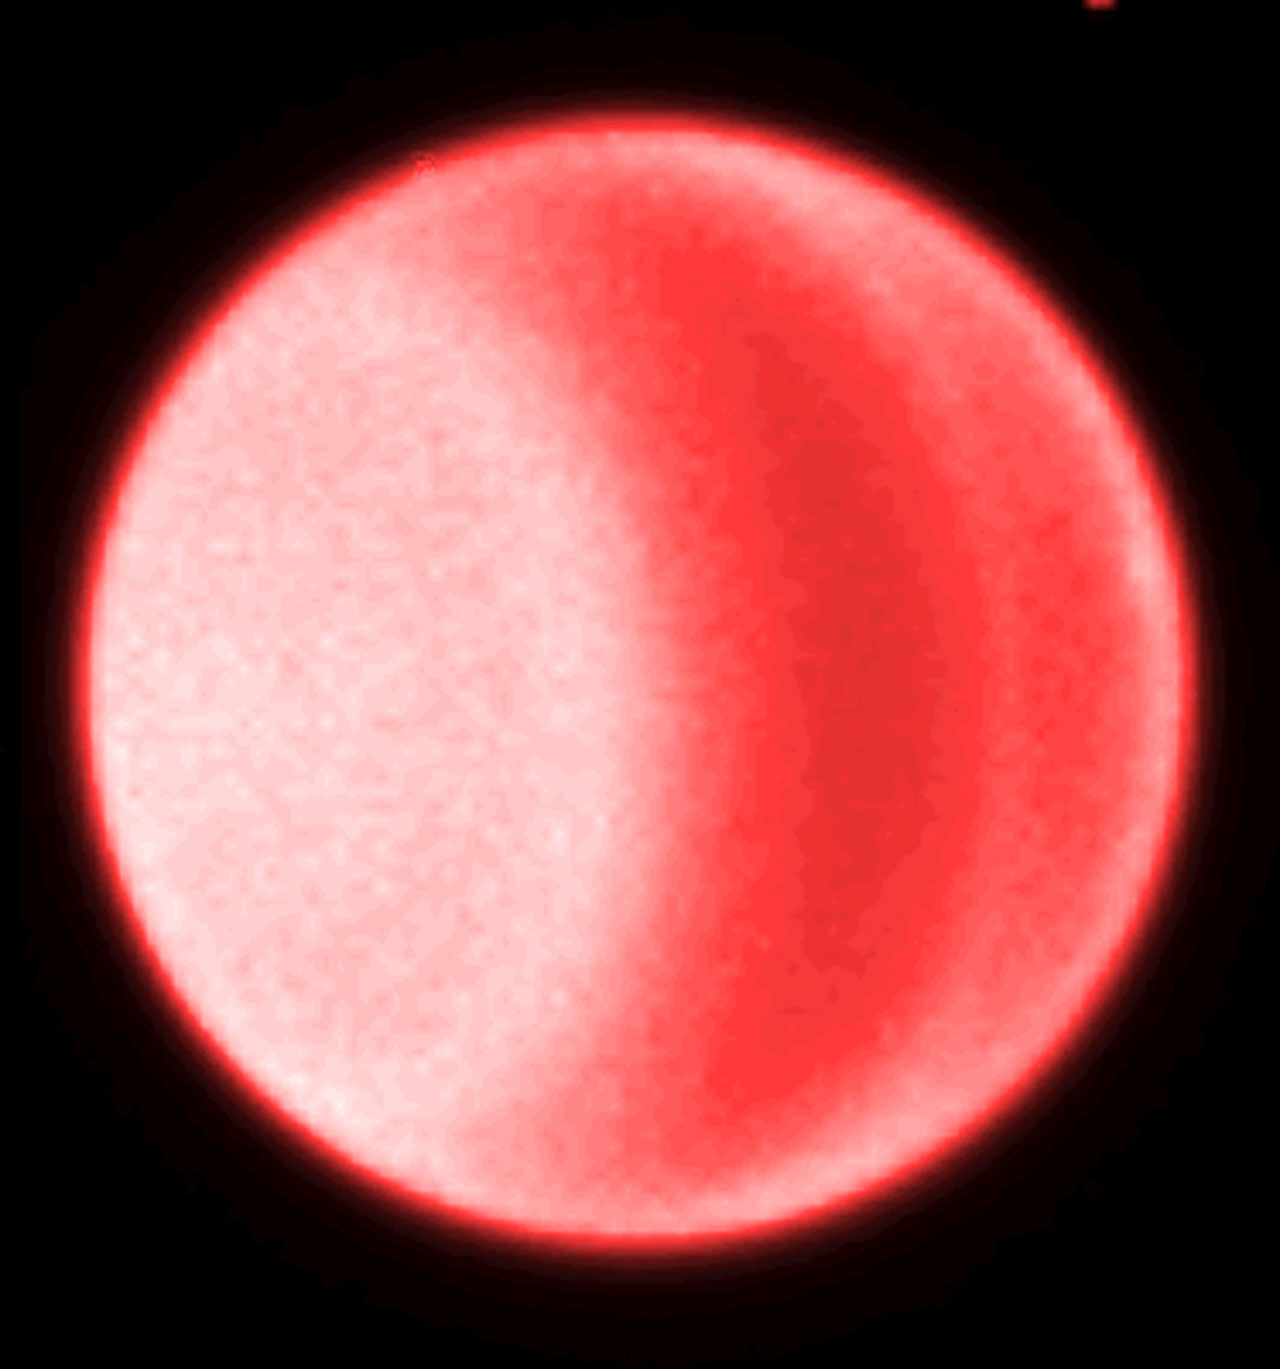 Hubble Spots Northern Hemispheric Clouds On Uranus